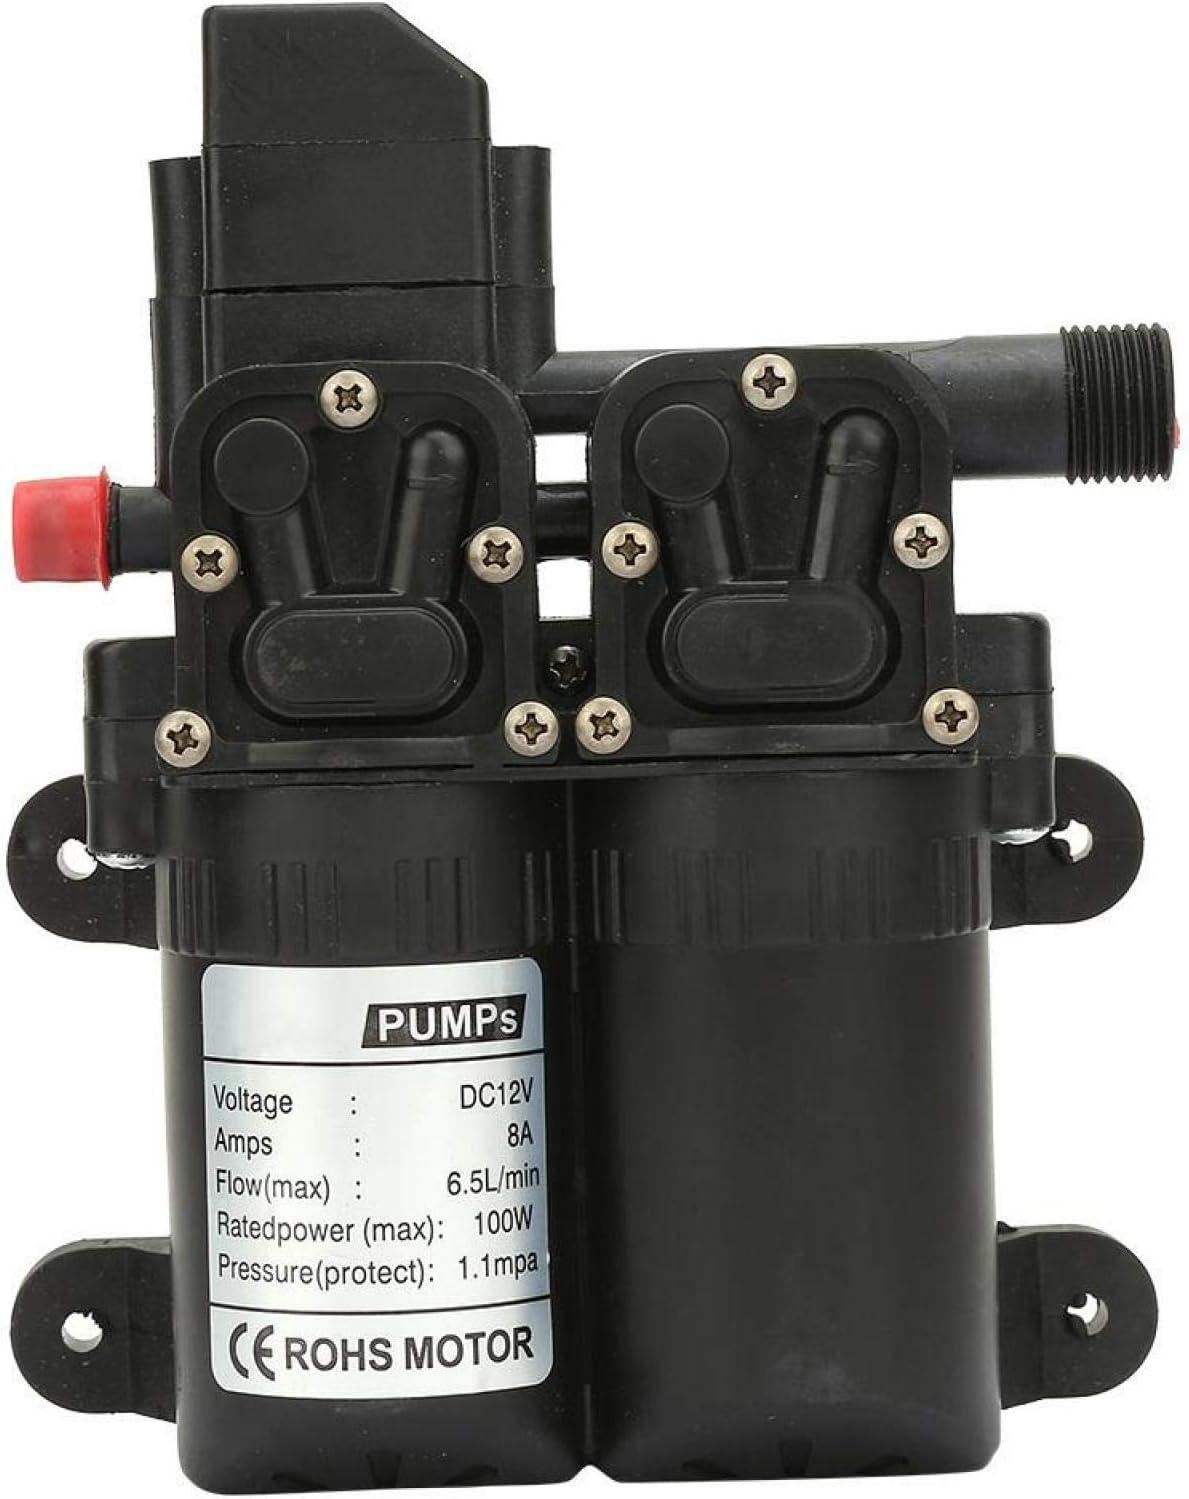 Self Priming Pump Double Diaphrag specialty shop Electric Wholesale Suction